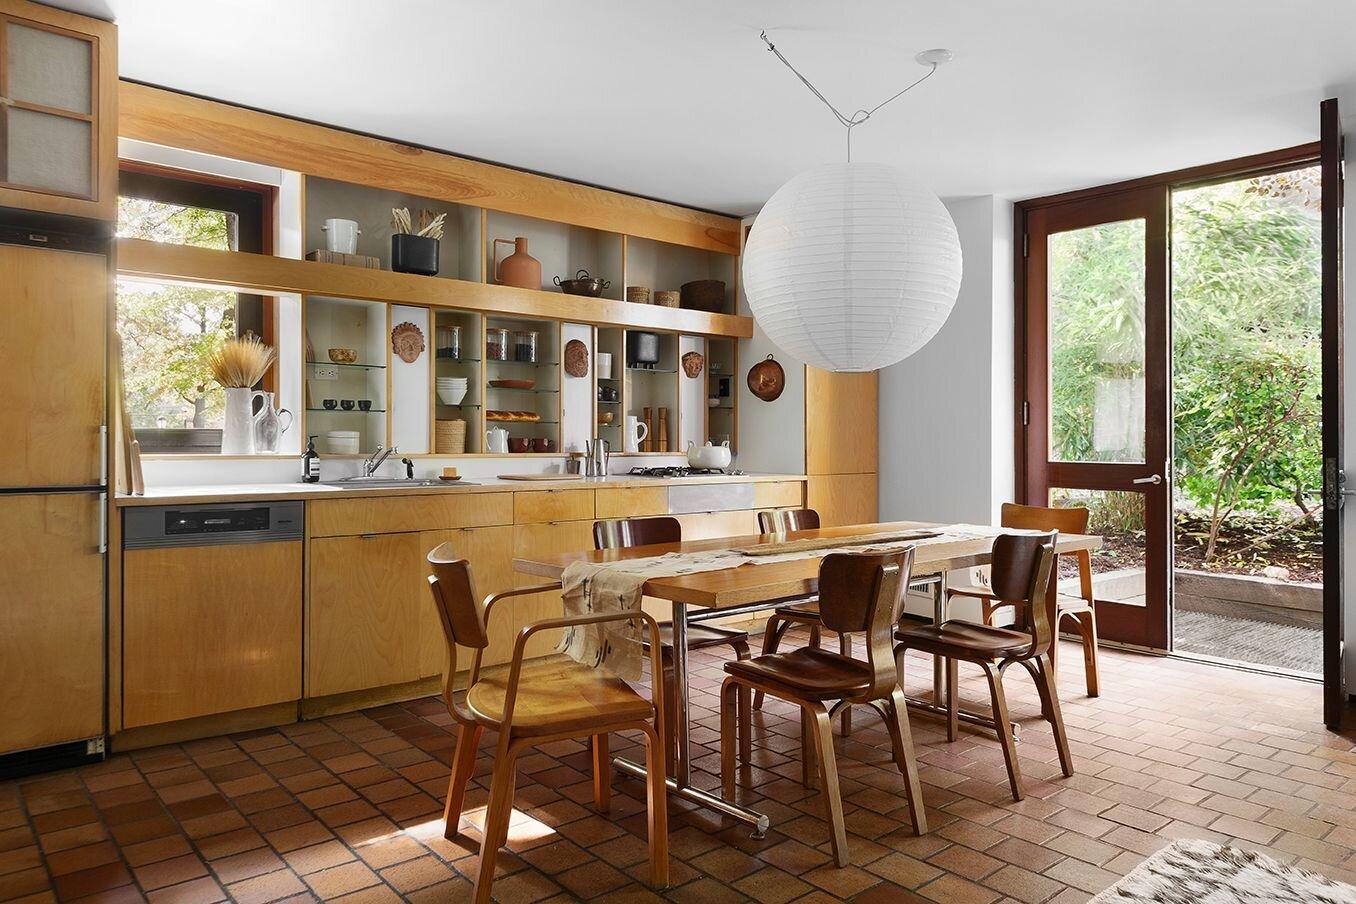 Joseph and Mary Merz Residence kitchen